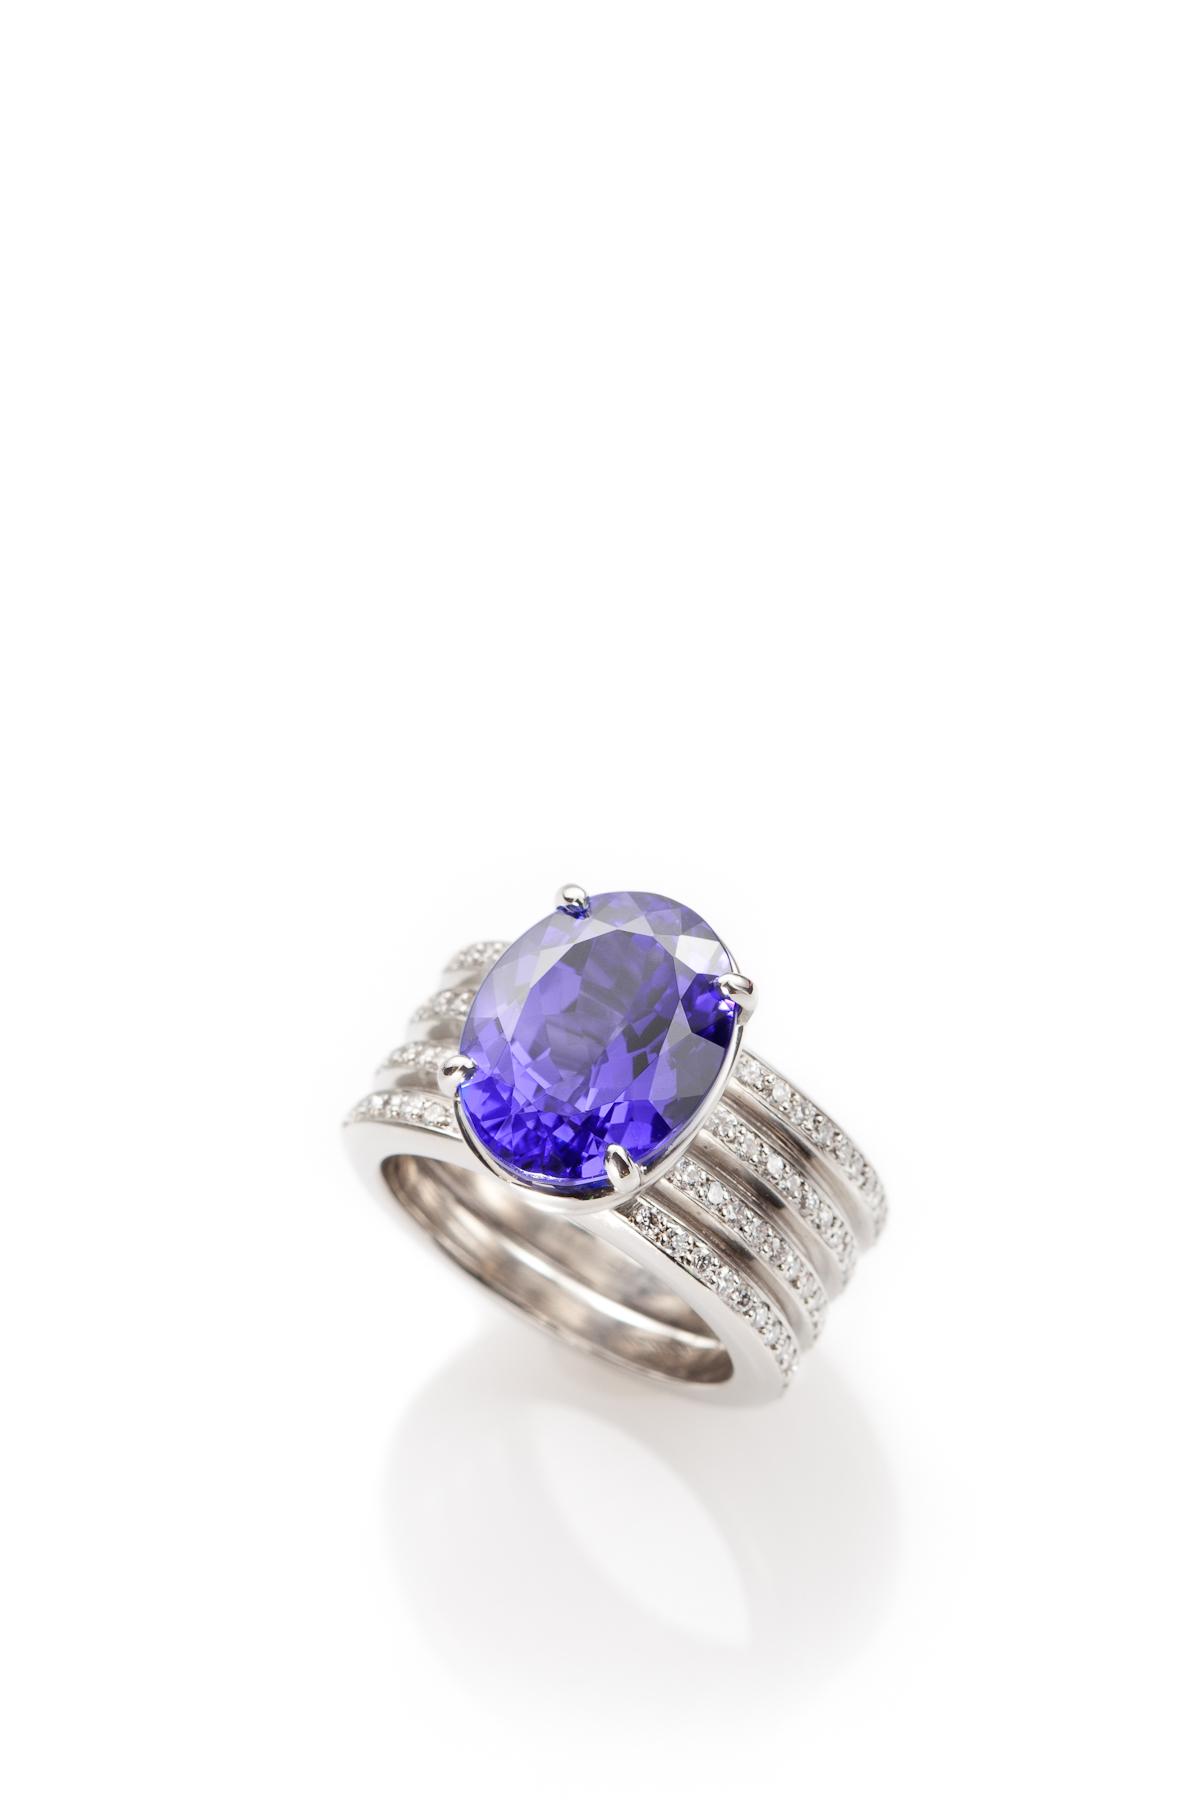 Tanzanite Ring in Platinum with Diamonds